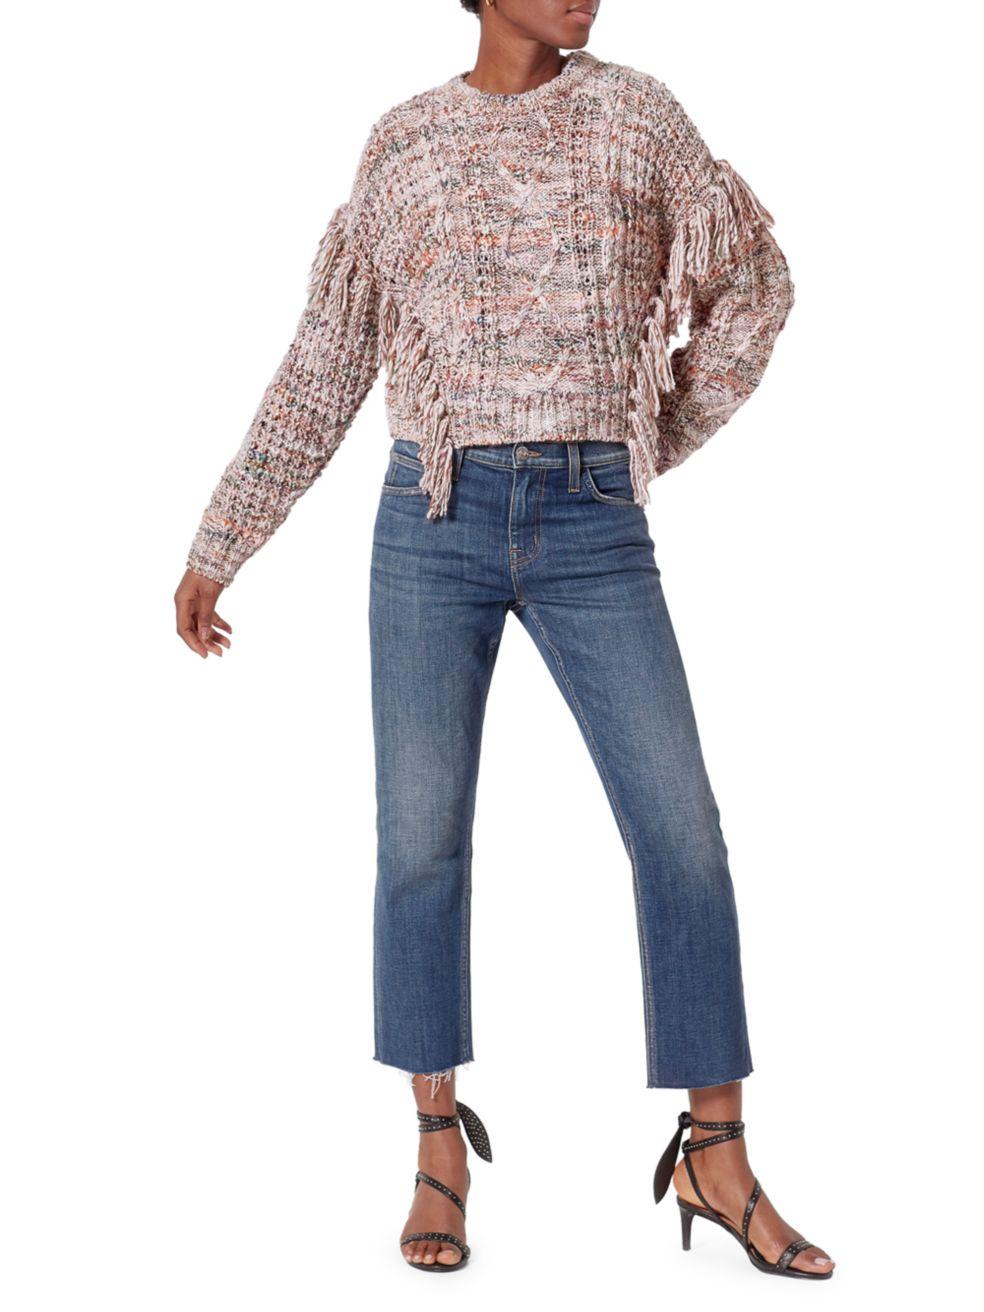 Joie Meghan Fringe Trim Sweater | SaksFifthAvenue